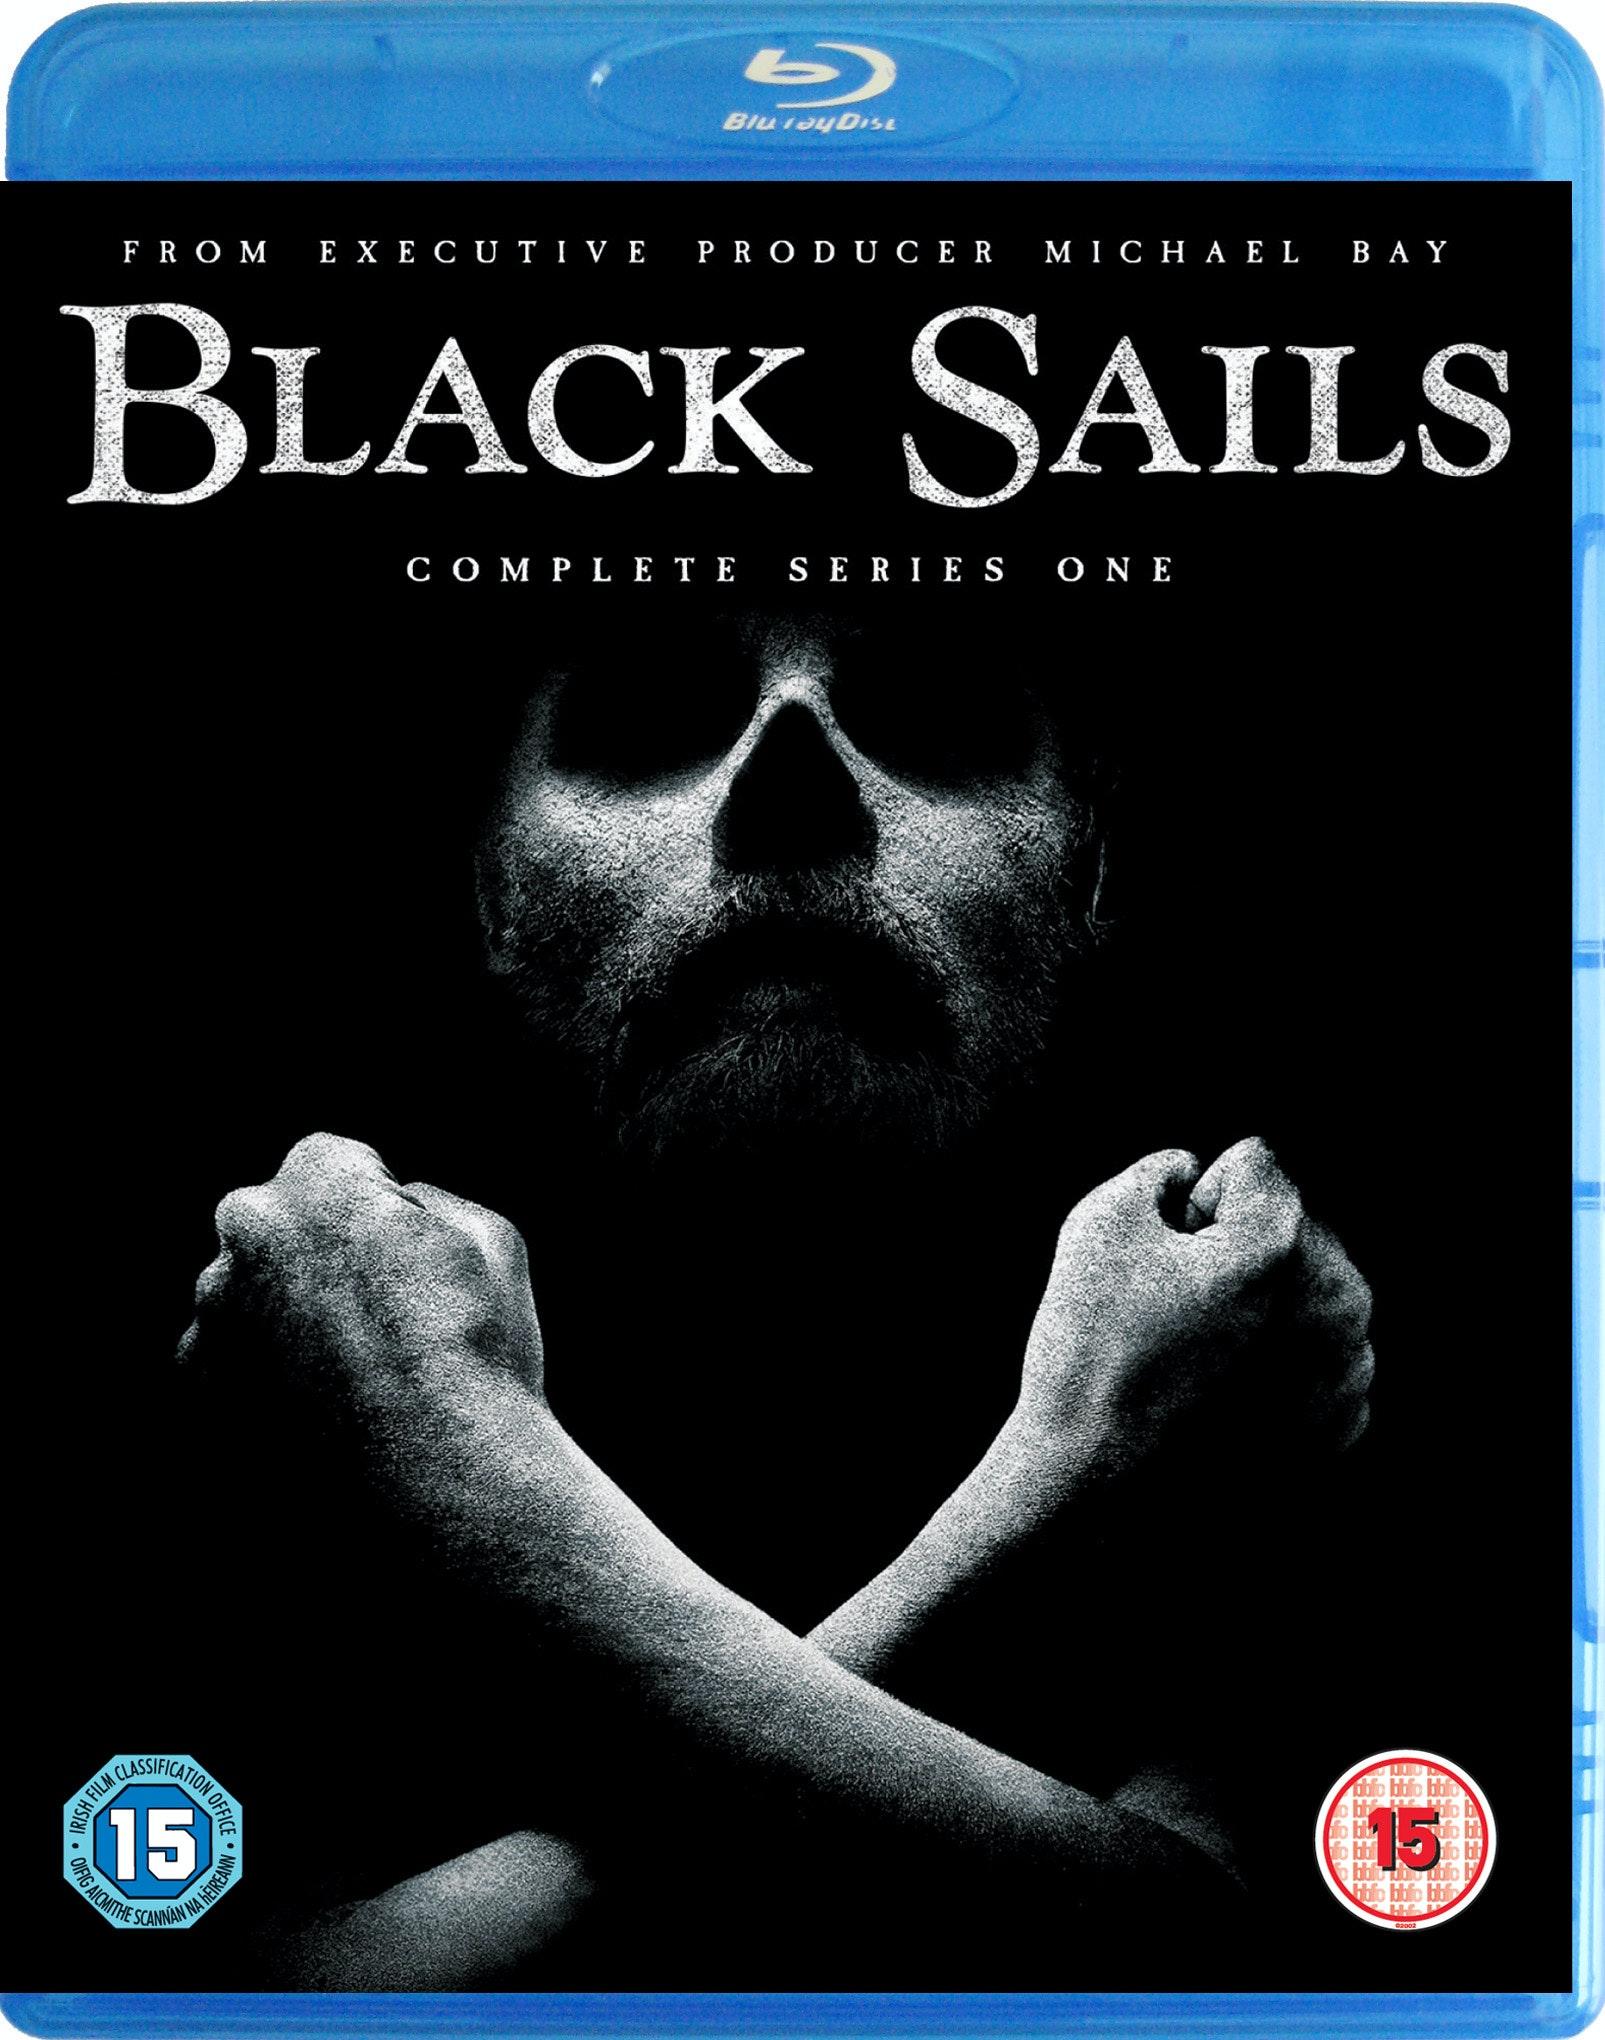 Black Sails blu-ray sweepstakes